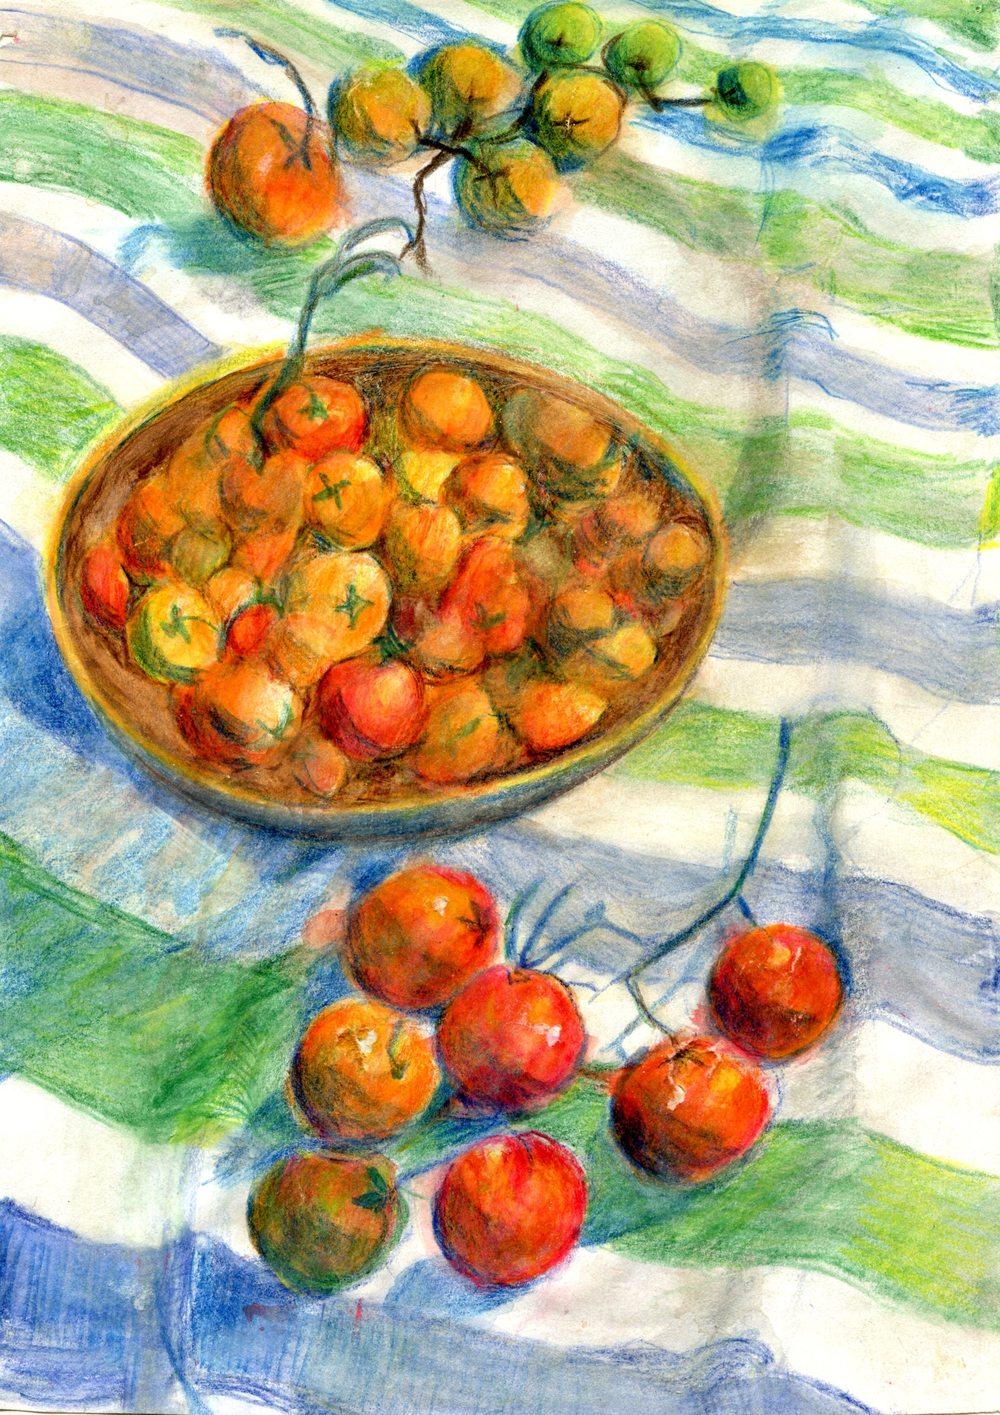 Fairlamb, Ruth  40b Cherry Tomatoes, Aquarelle.